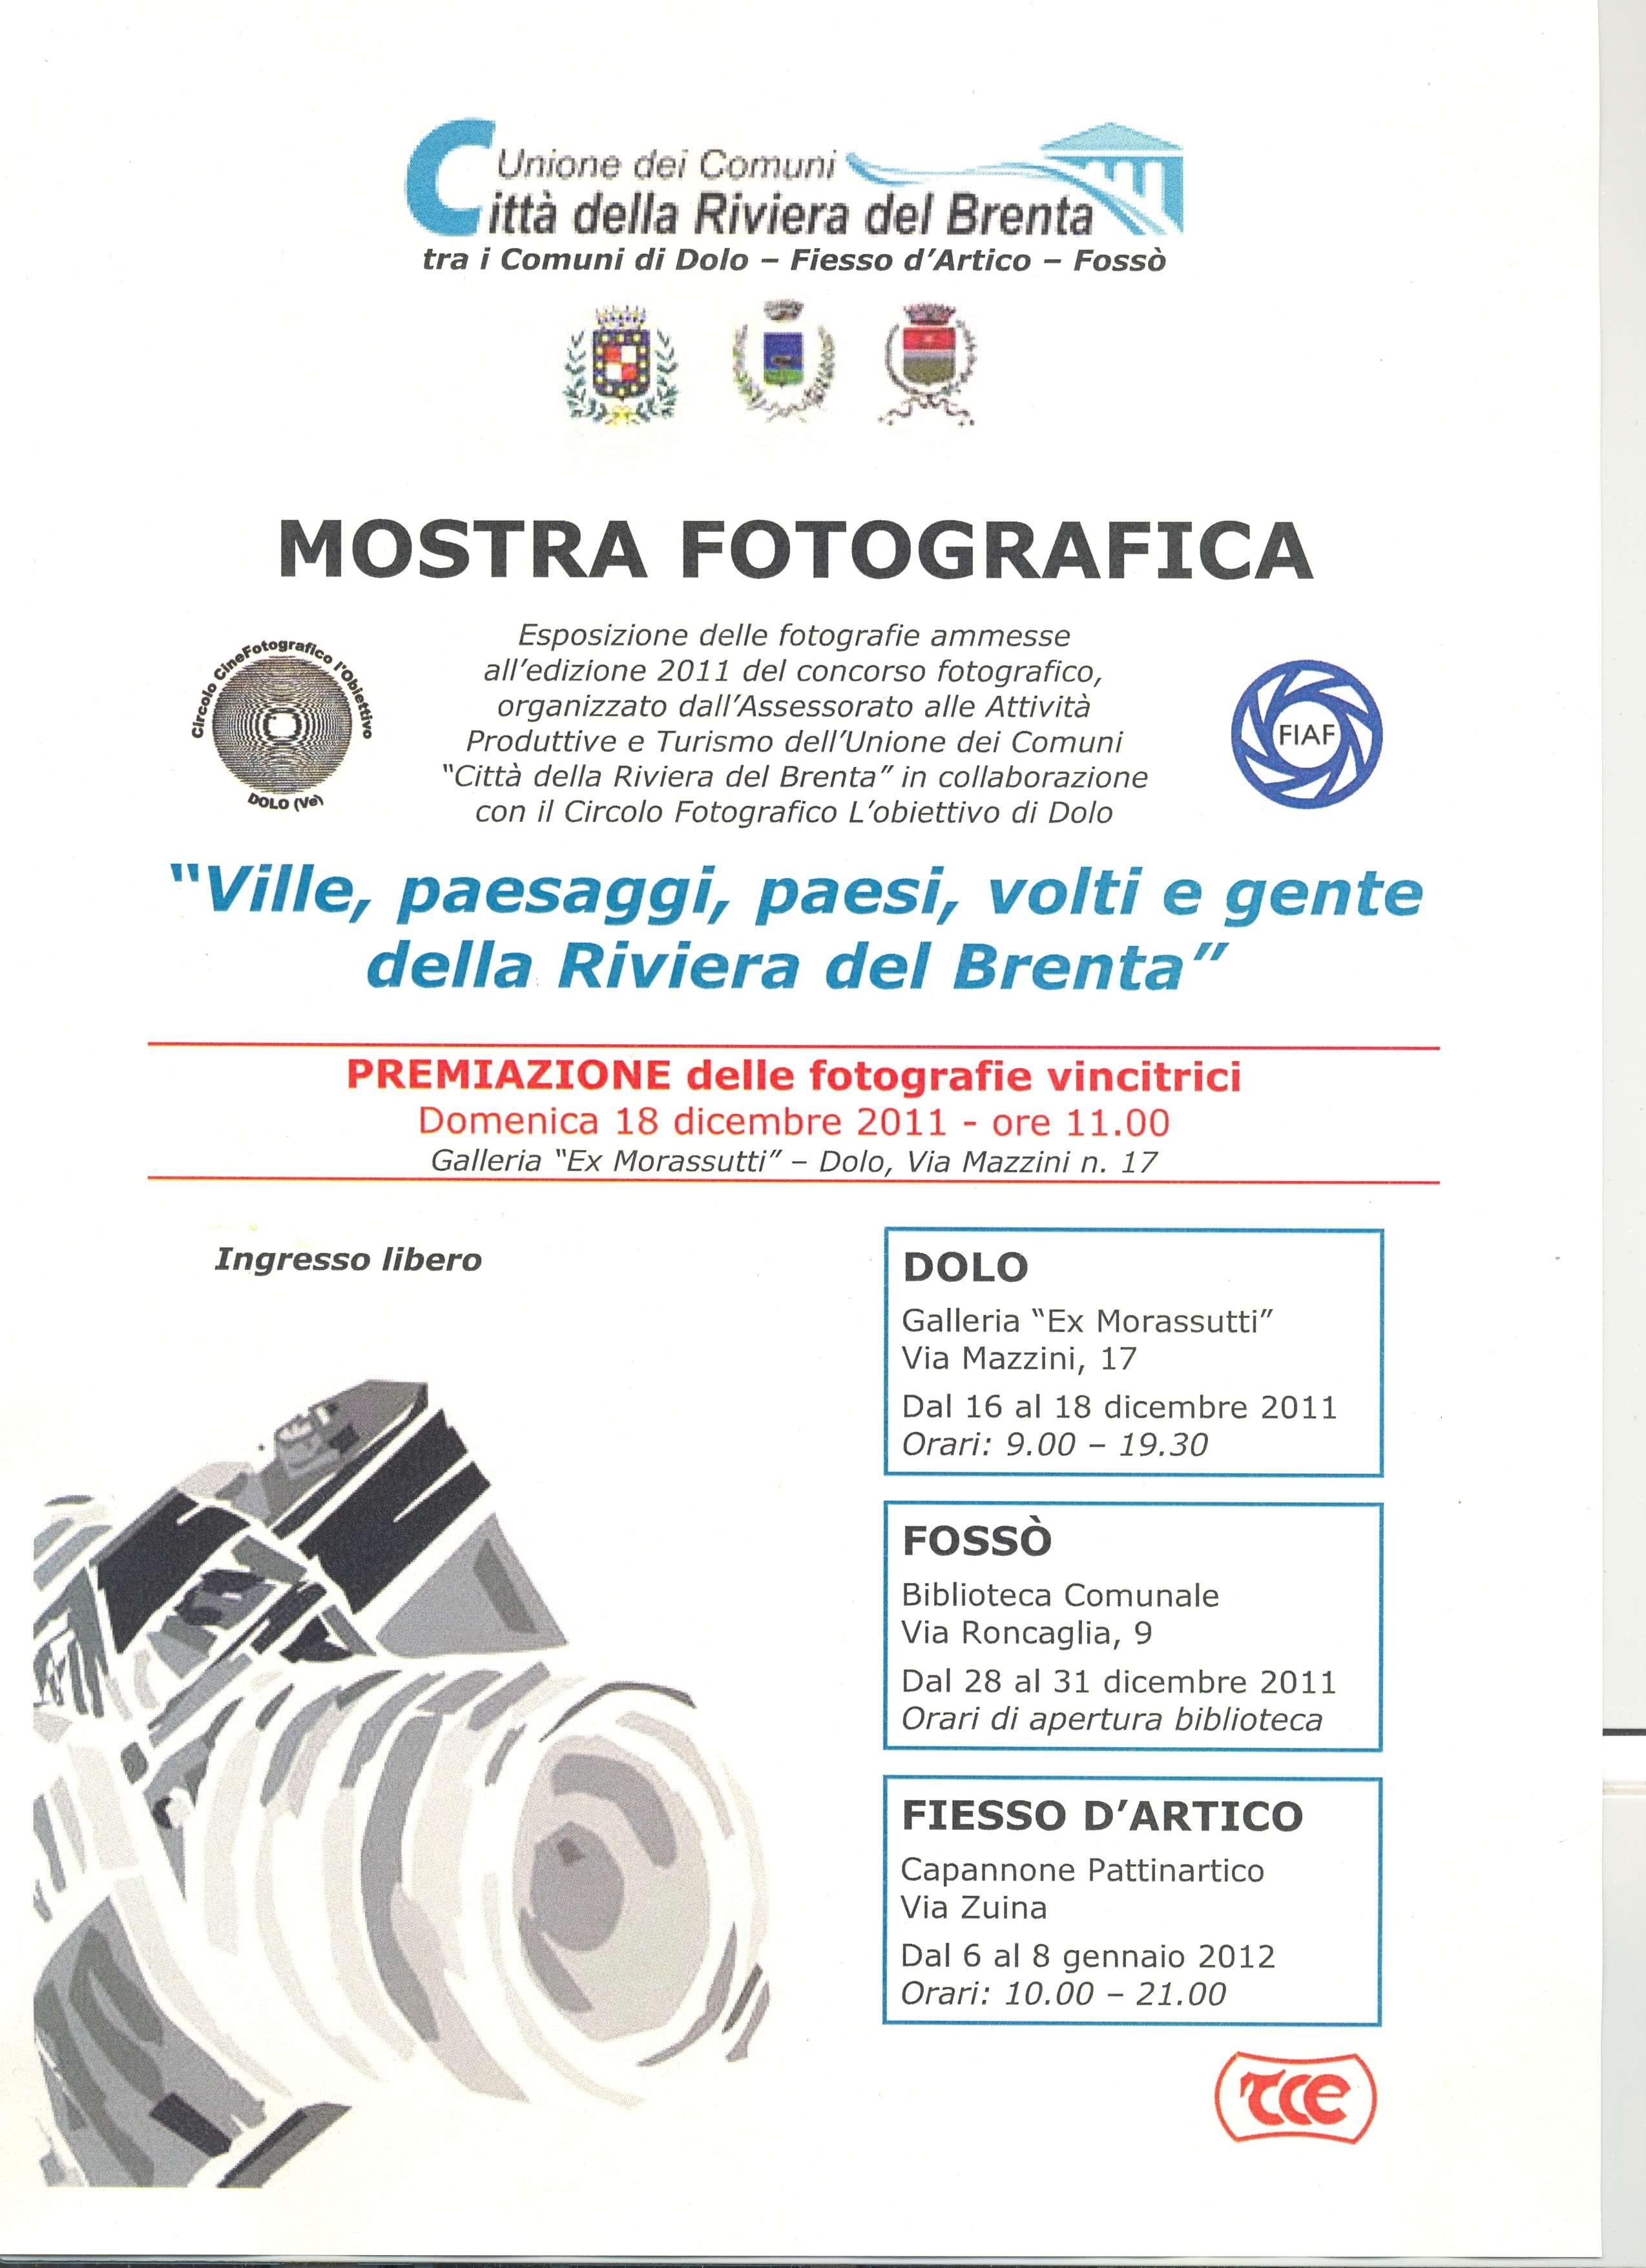 mostraVillePaesaggioPaesi16-18_12_11_locandina.JPG